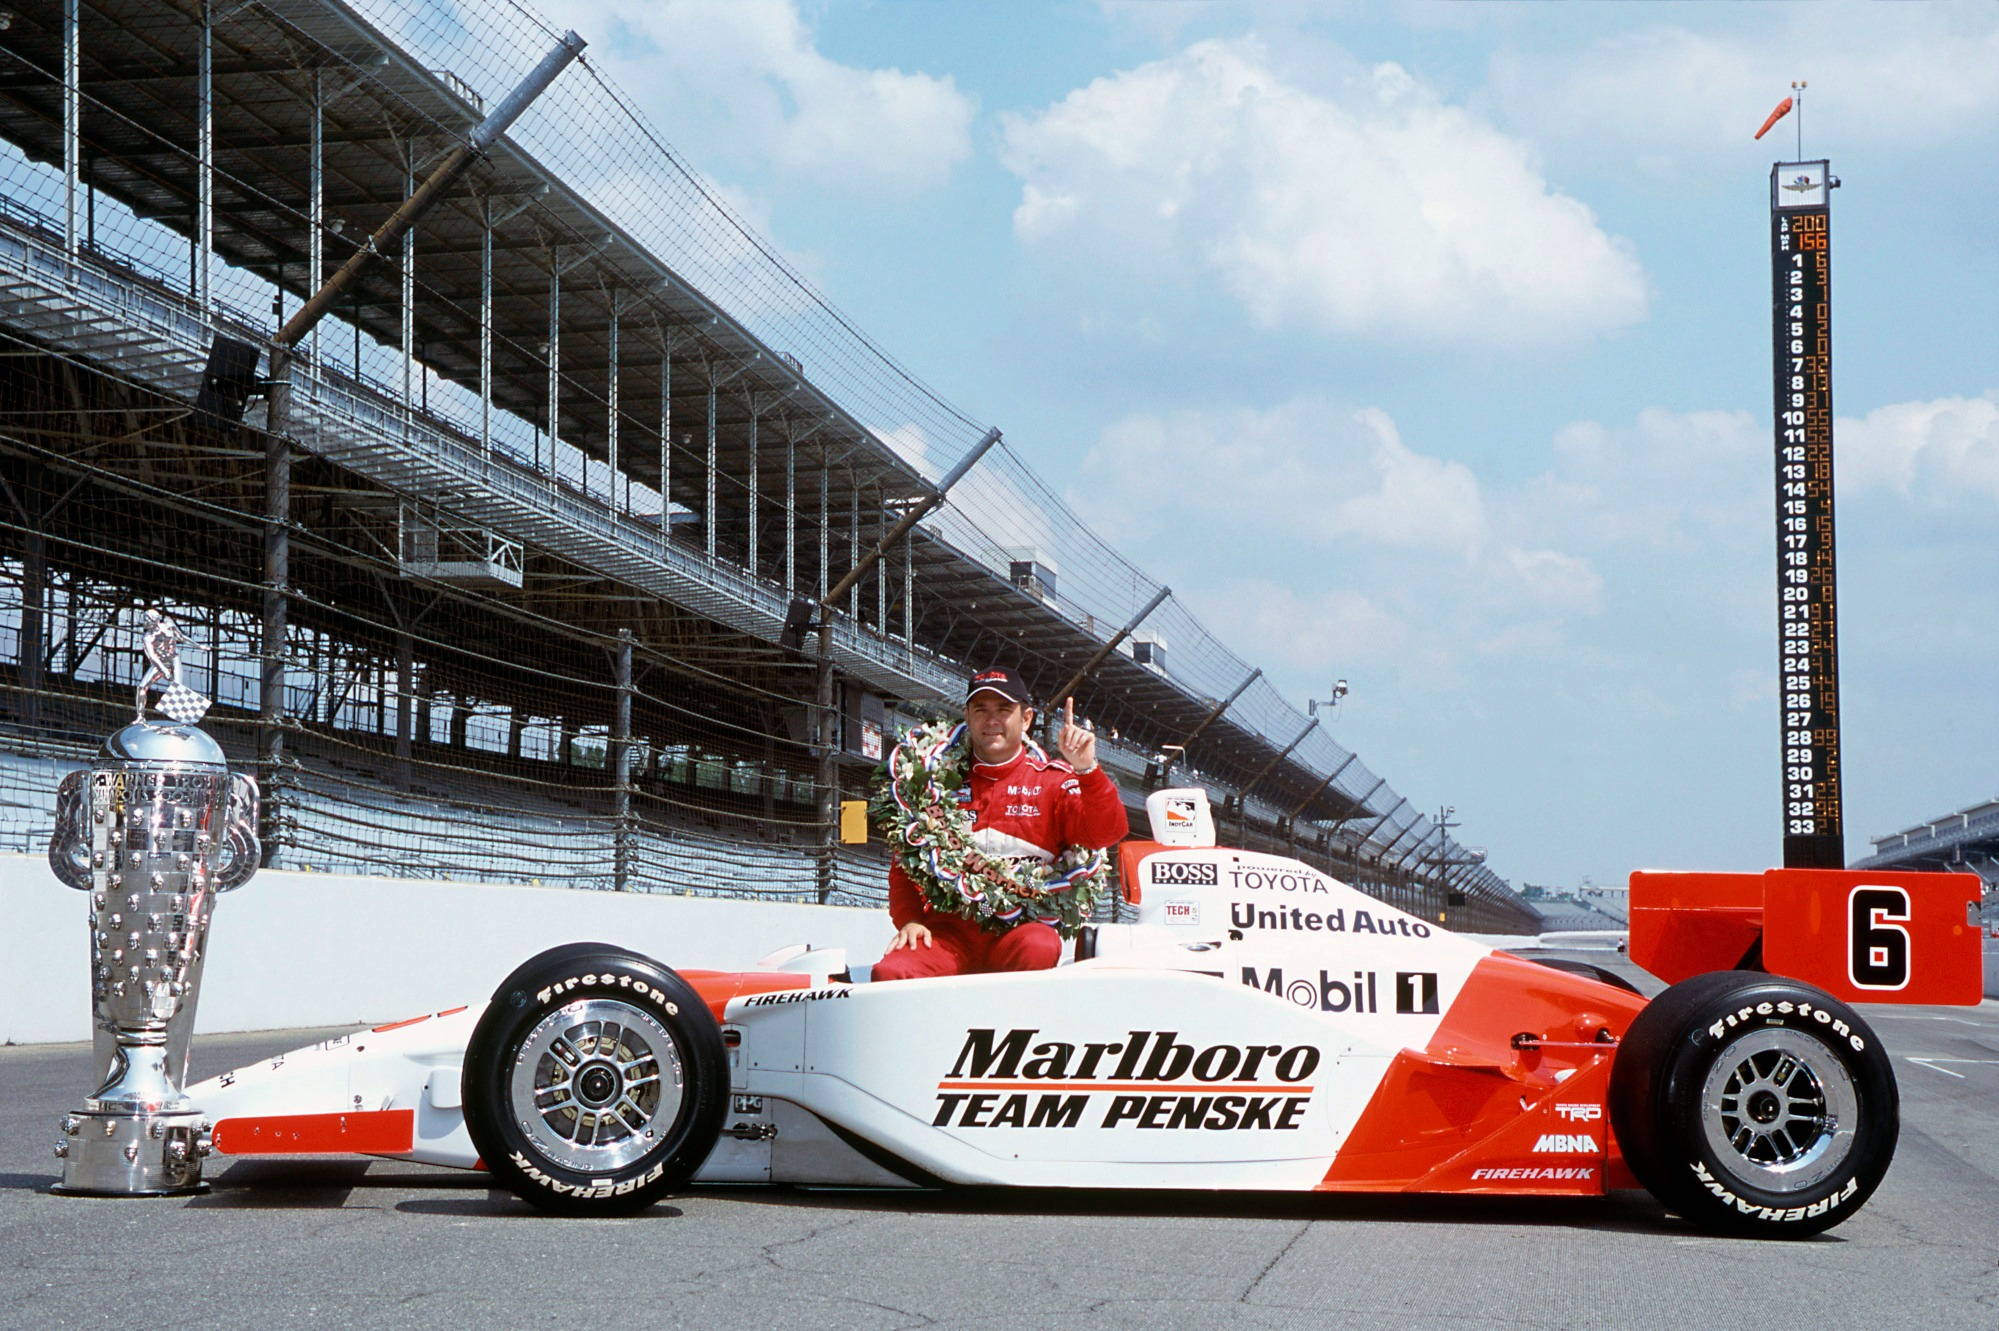 Gil de Ferran, 2003 Indianapolis 500 winner